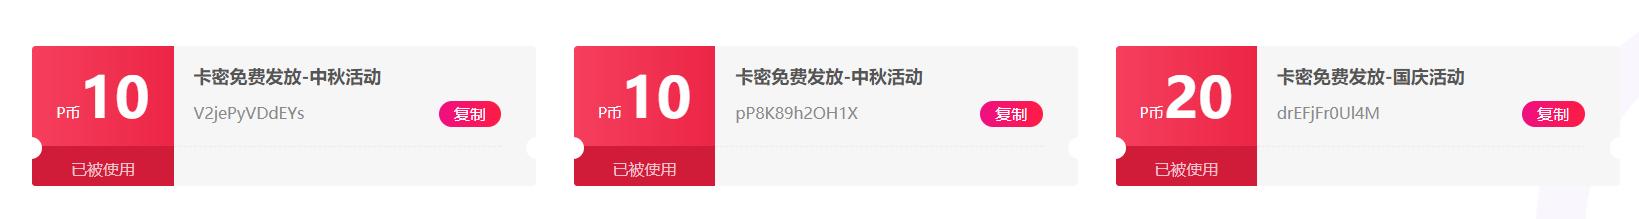 RiPro优惠码插件1.21版本_支付购买资源优惠码、开通会员专用优惠码